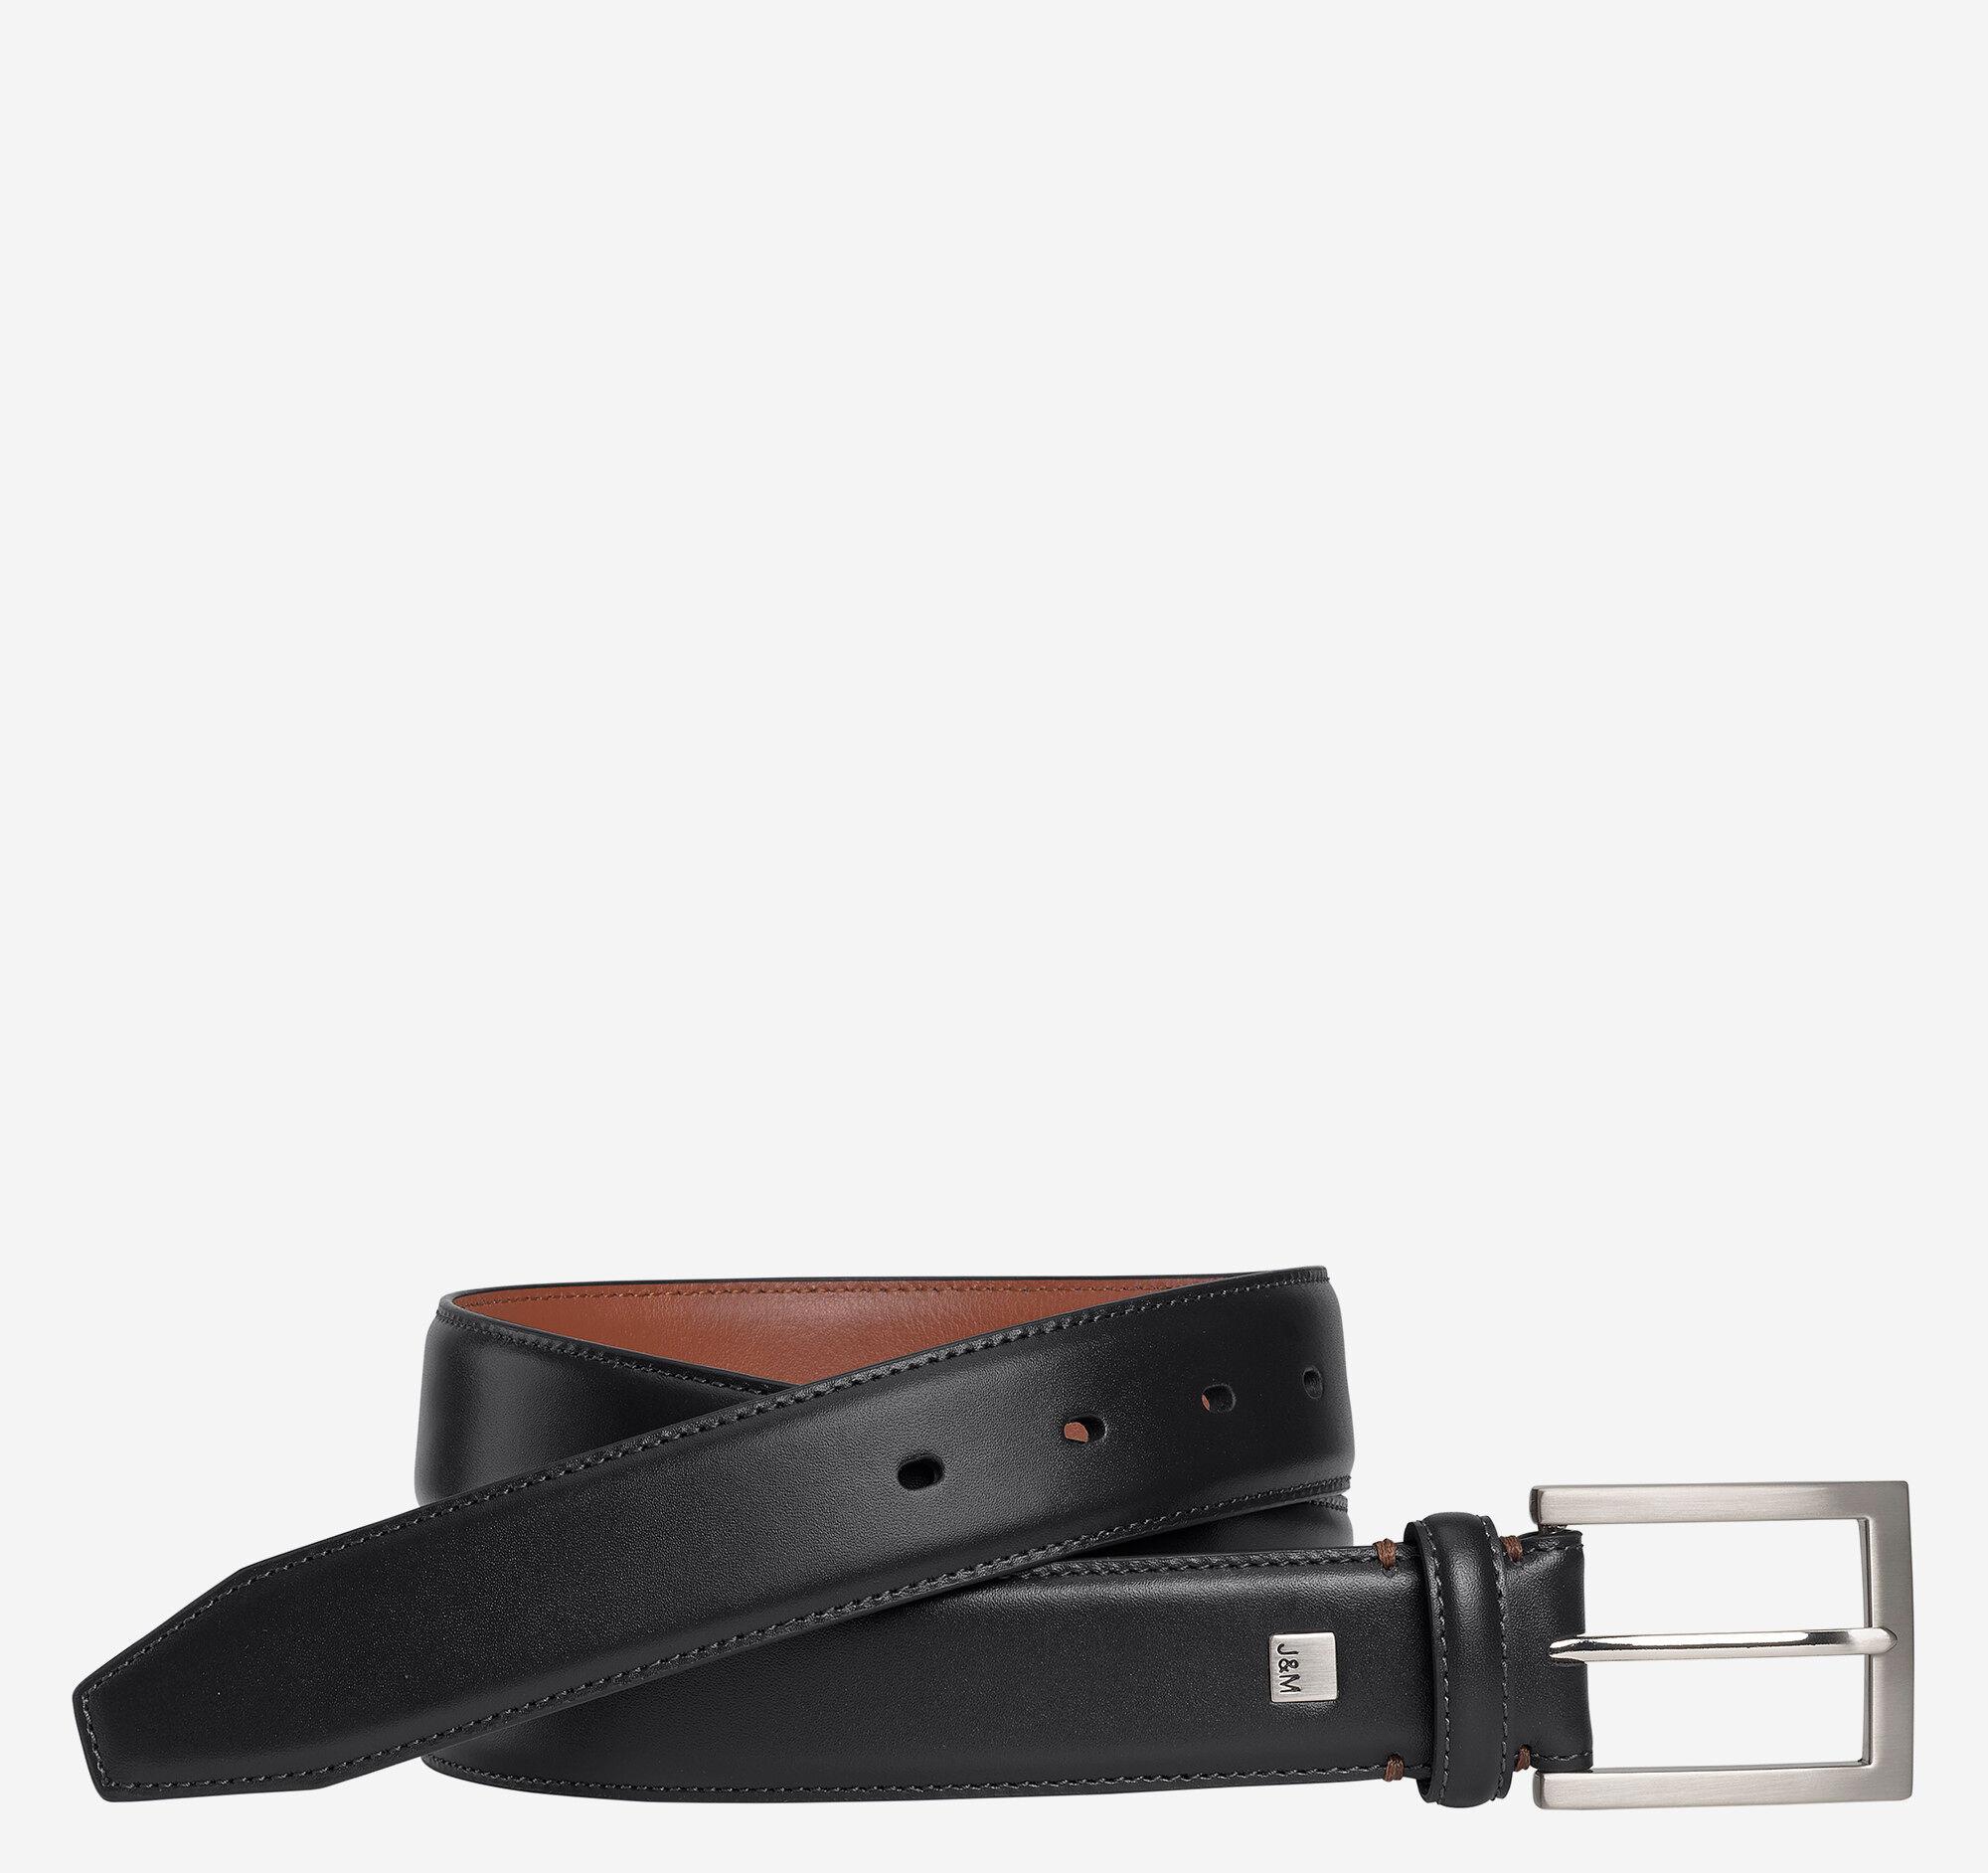 Johnston & Murphy Men's Johnston Murphy Dress Belt - Black - Size 36